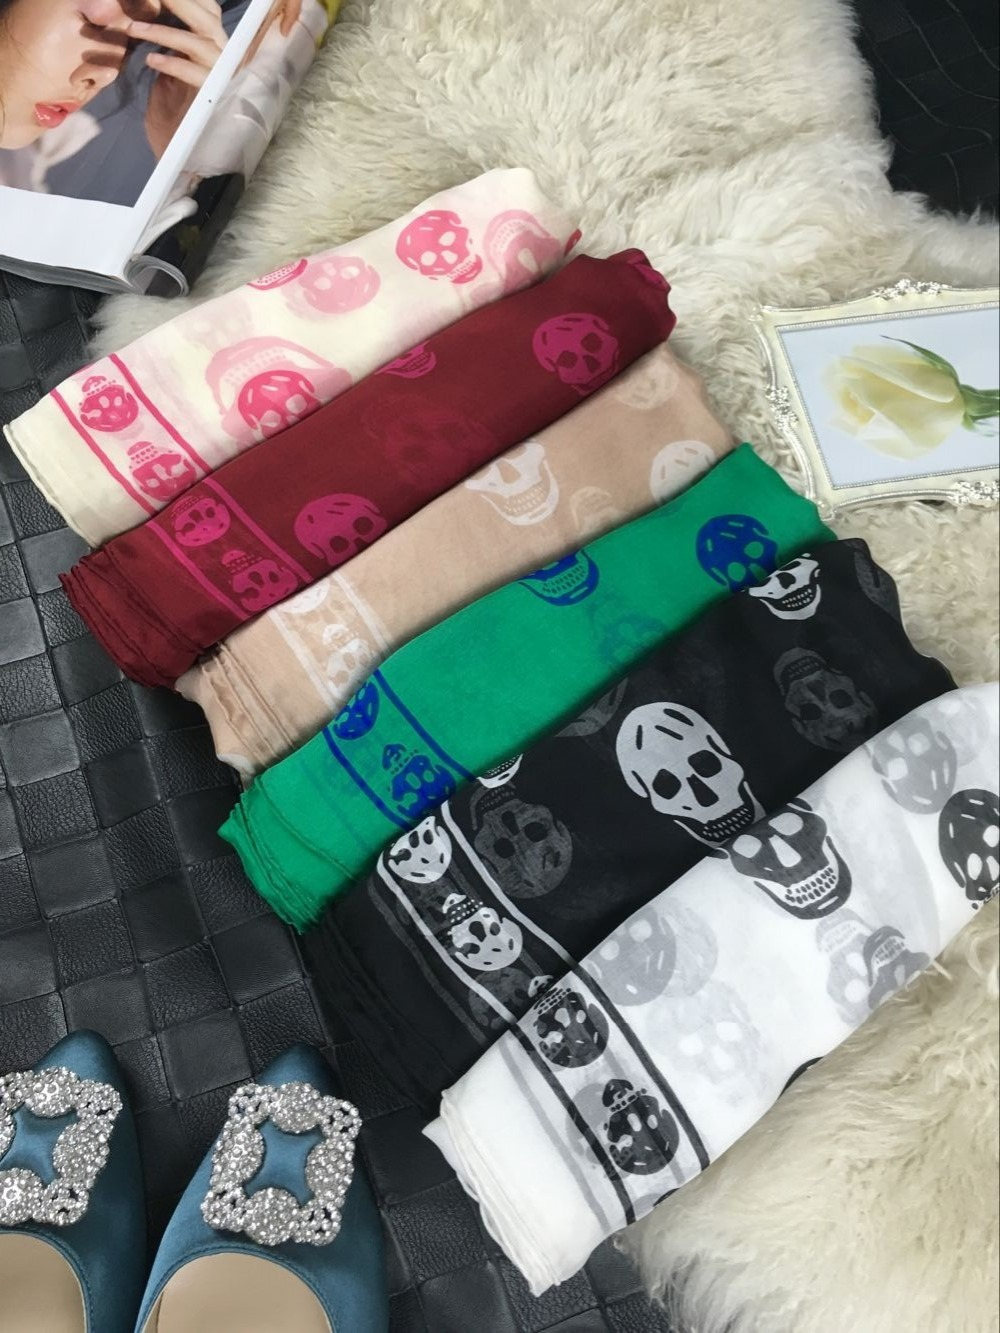 Skull head Women Twill Silk Square Scarf Scarves Luxury Brand Handmade Hemming Headwear Shawl Wrap Gift